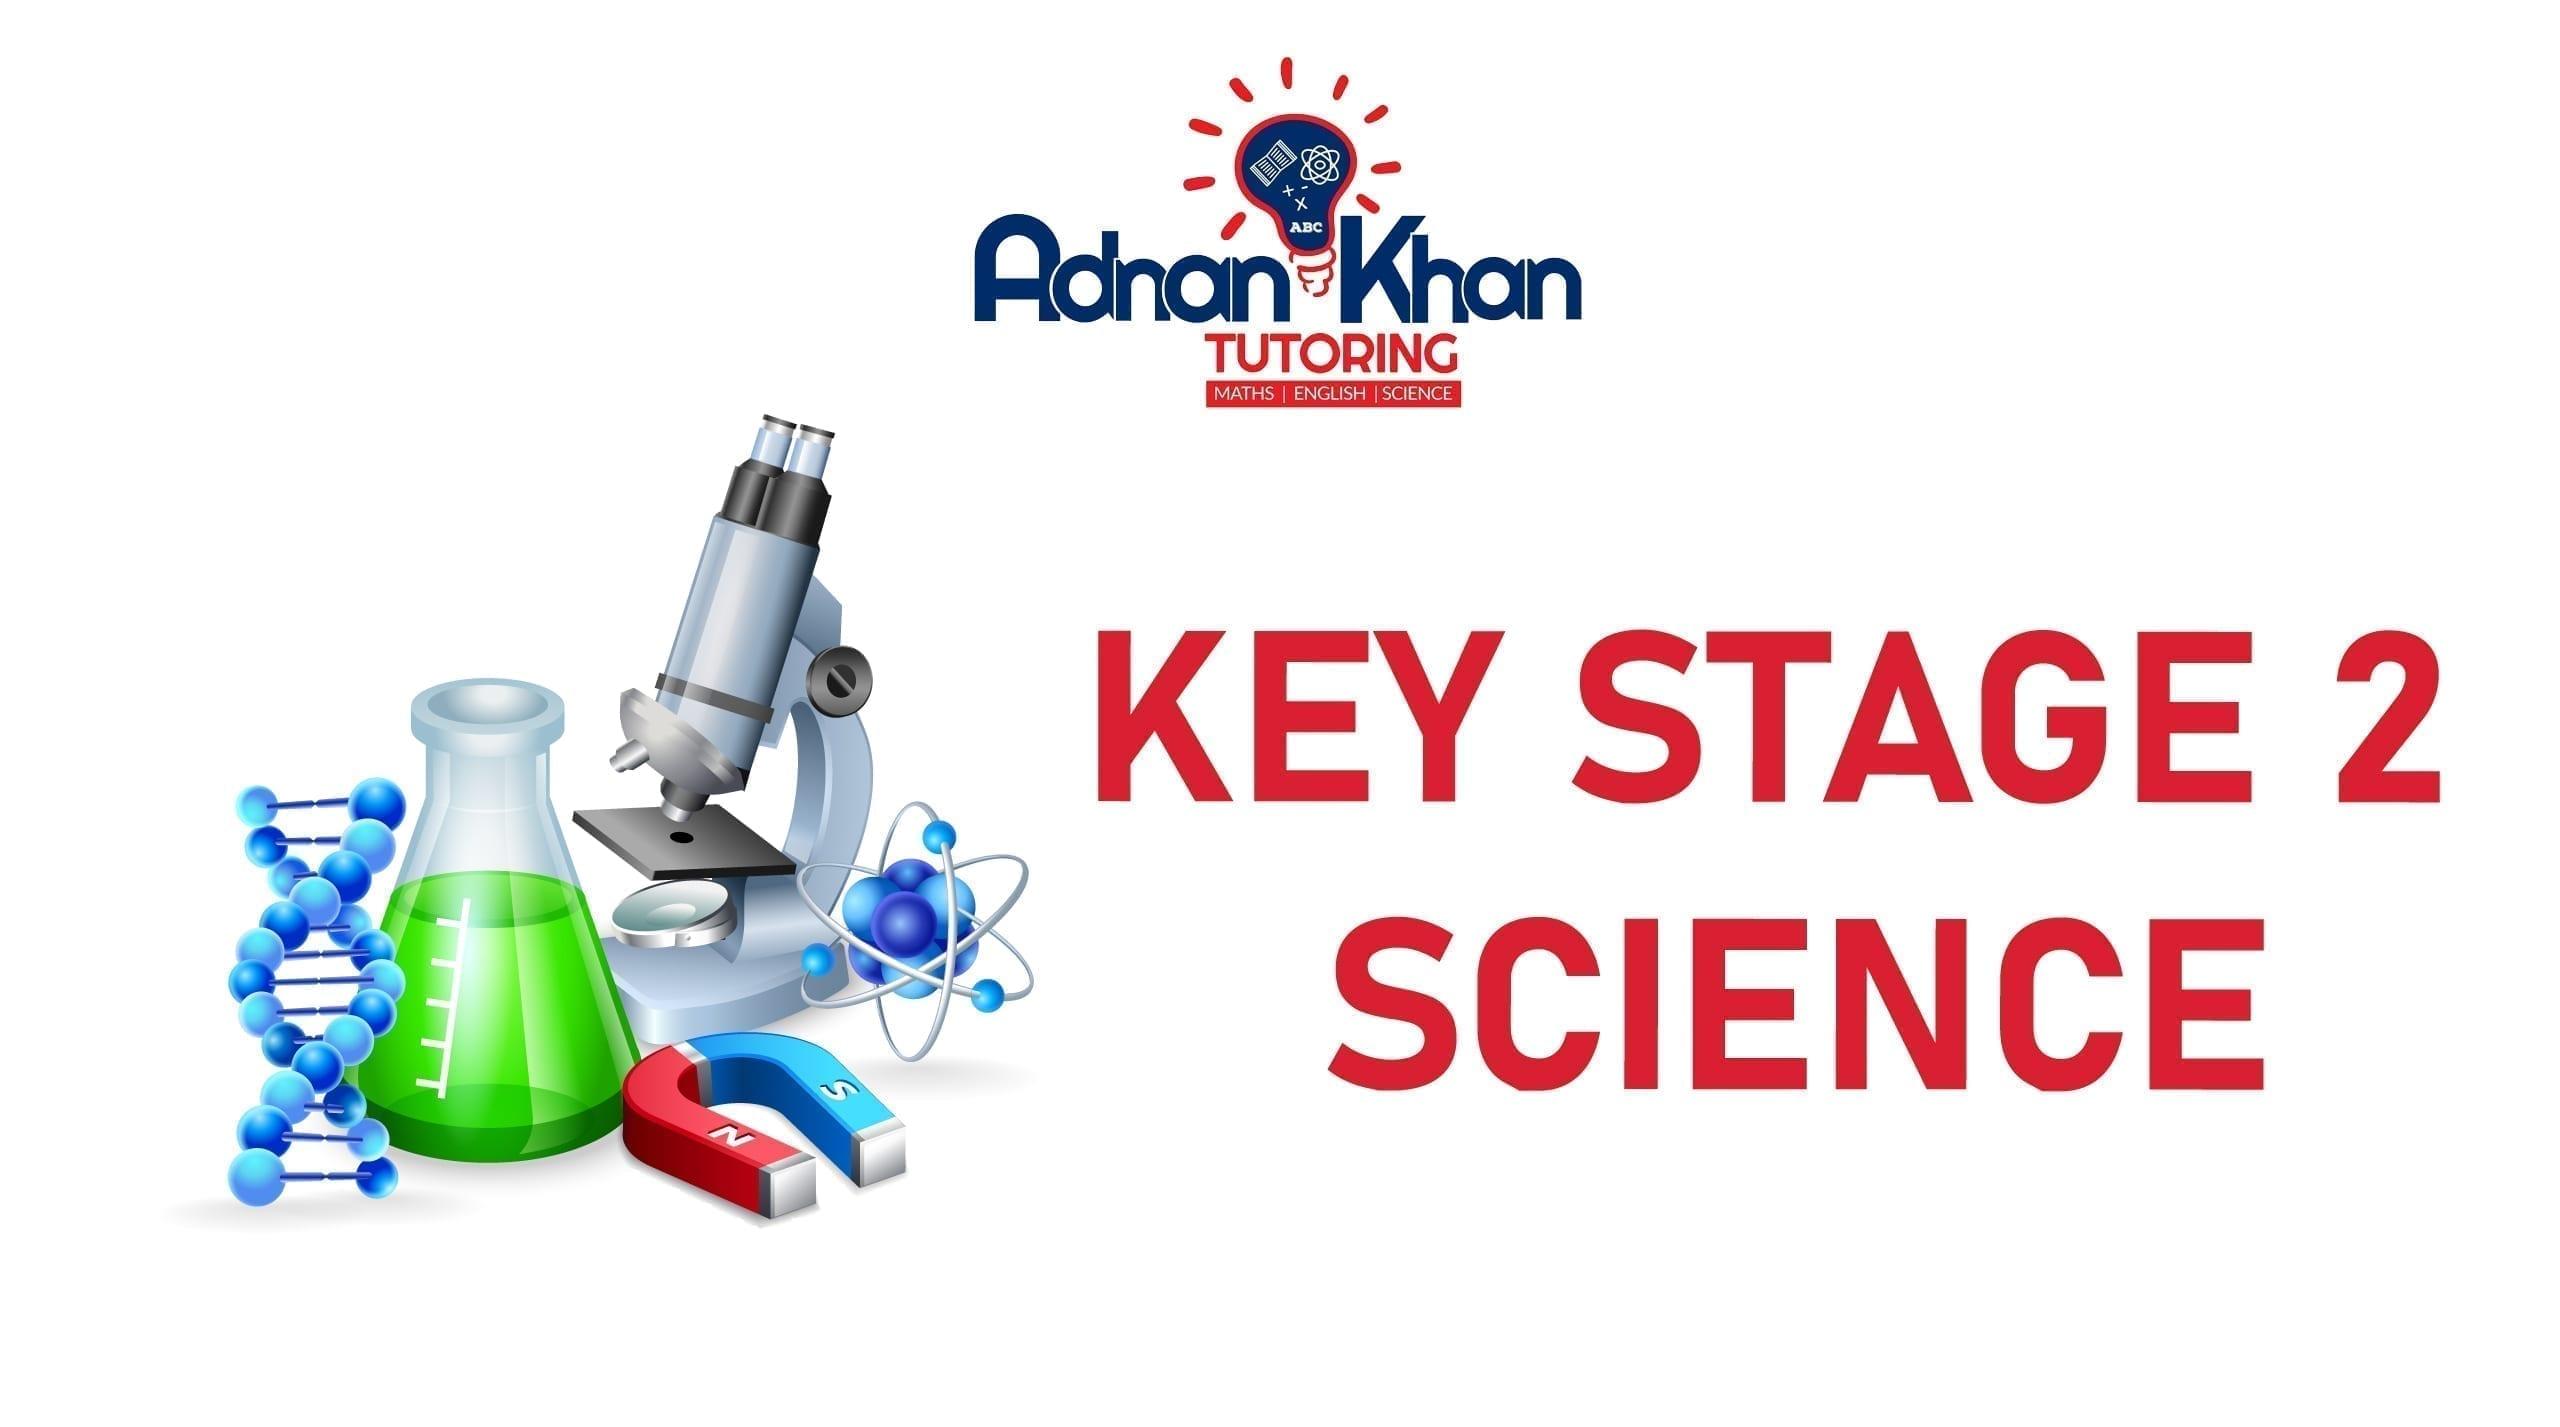 ks2_science_featuredimage_08-12-2020_adnankhantutoring.co_.uk_